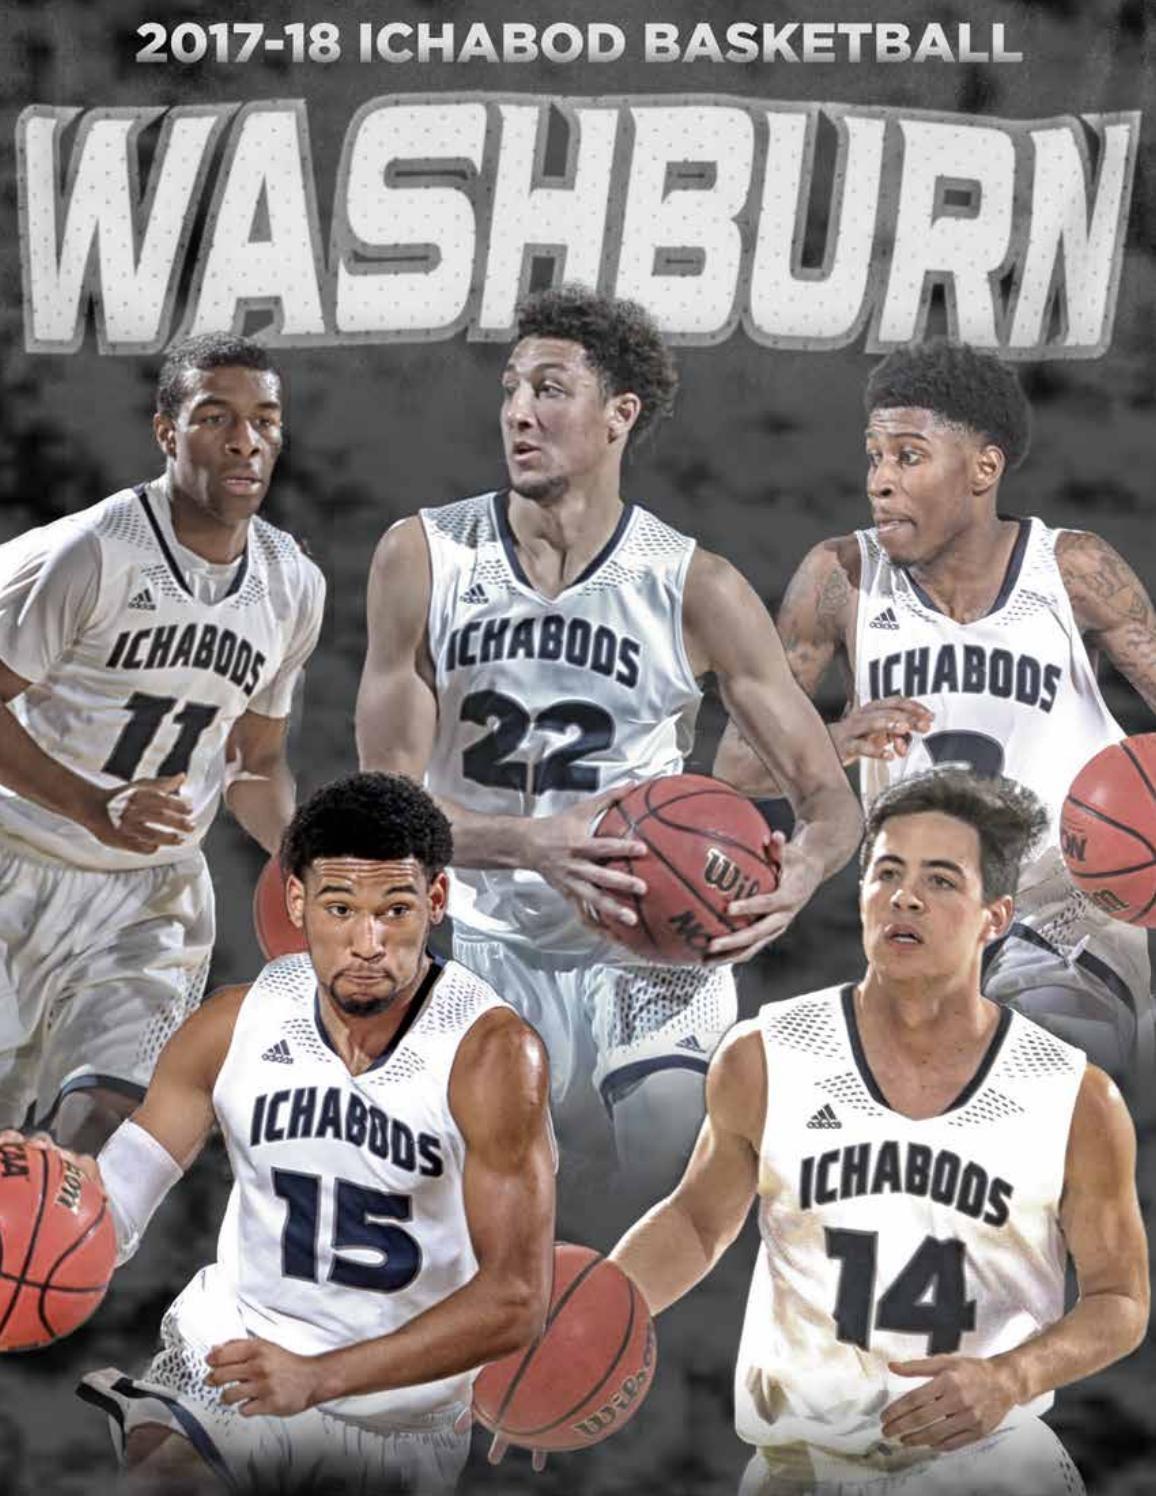 8bd5faedecca 2017-18 Washburn Ichabod Men s Basketball media guide by Washburn Athletics  - issuu